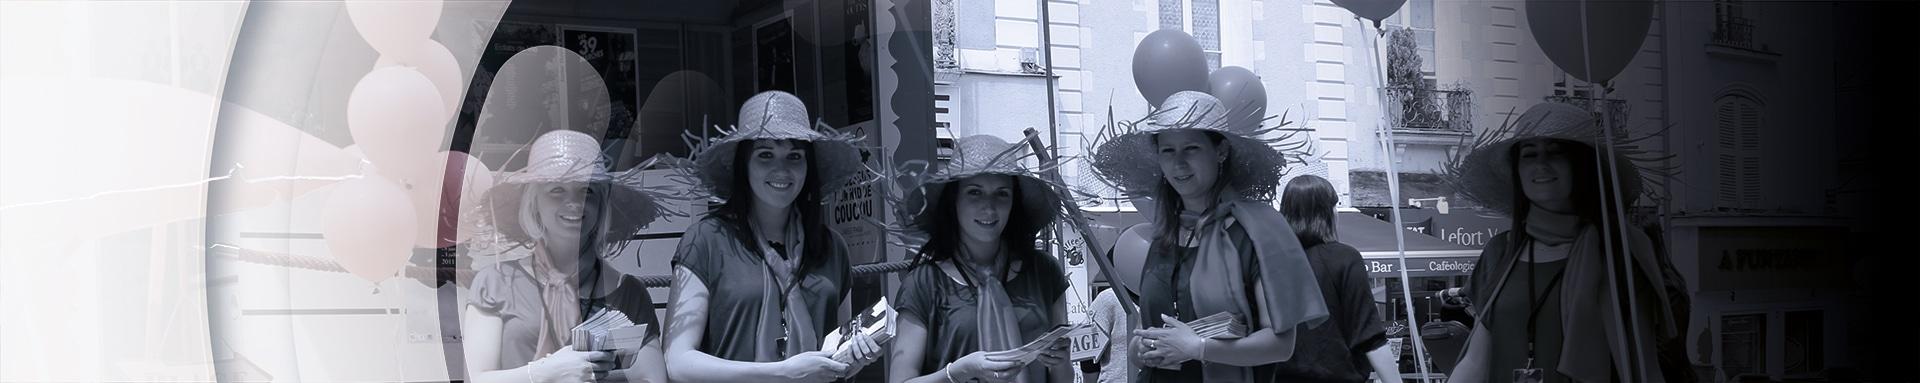 Street Marketing Hotesse Distribution - Andégave Communication